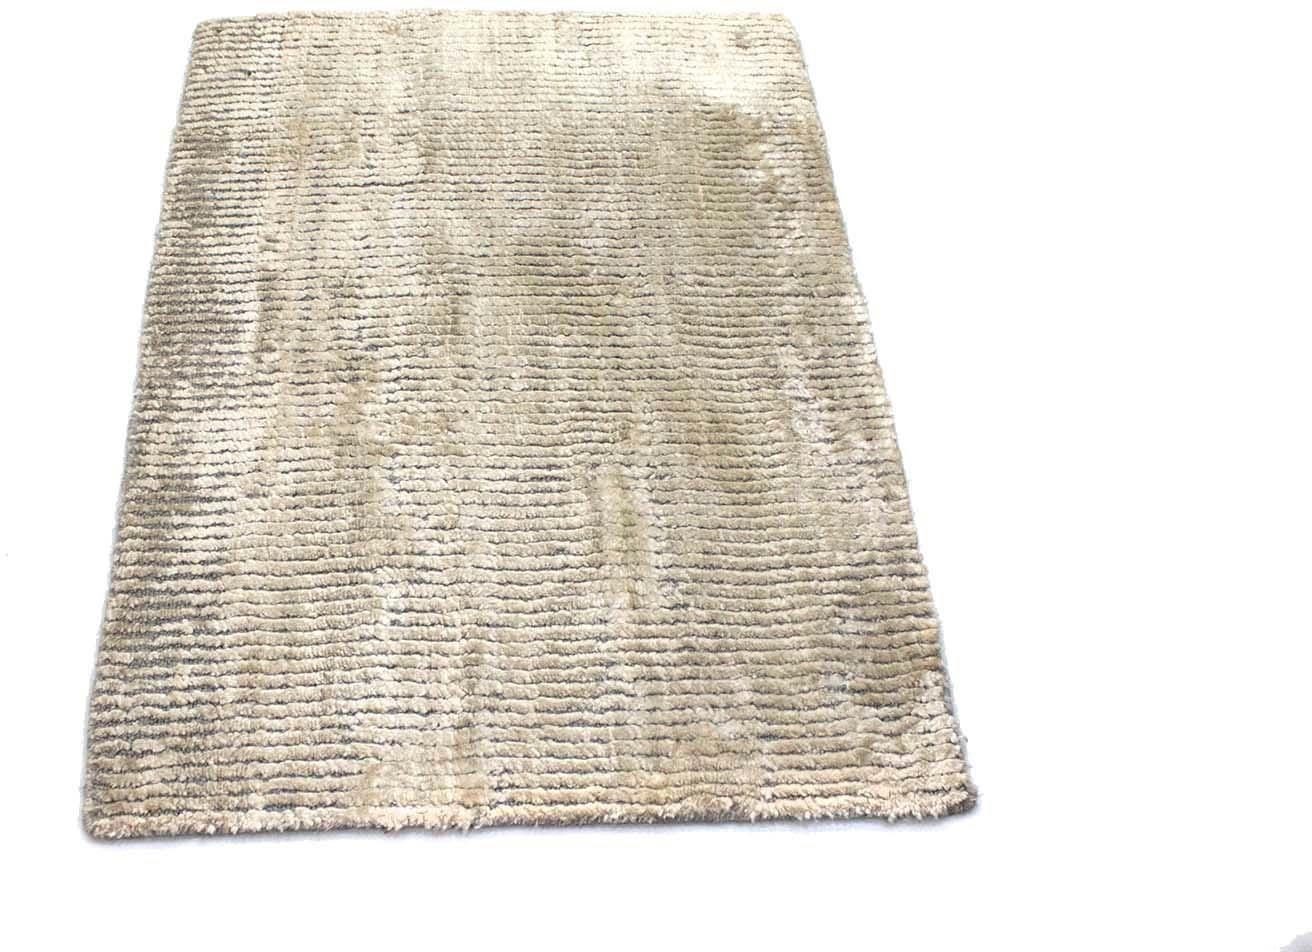 morgenland vloerkleed Loribaft Teppich handgewebt beige Viskose - verschillende betaalmethodes